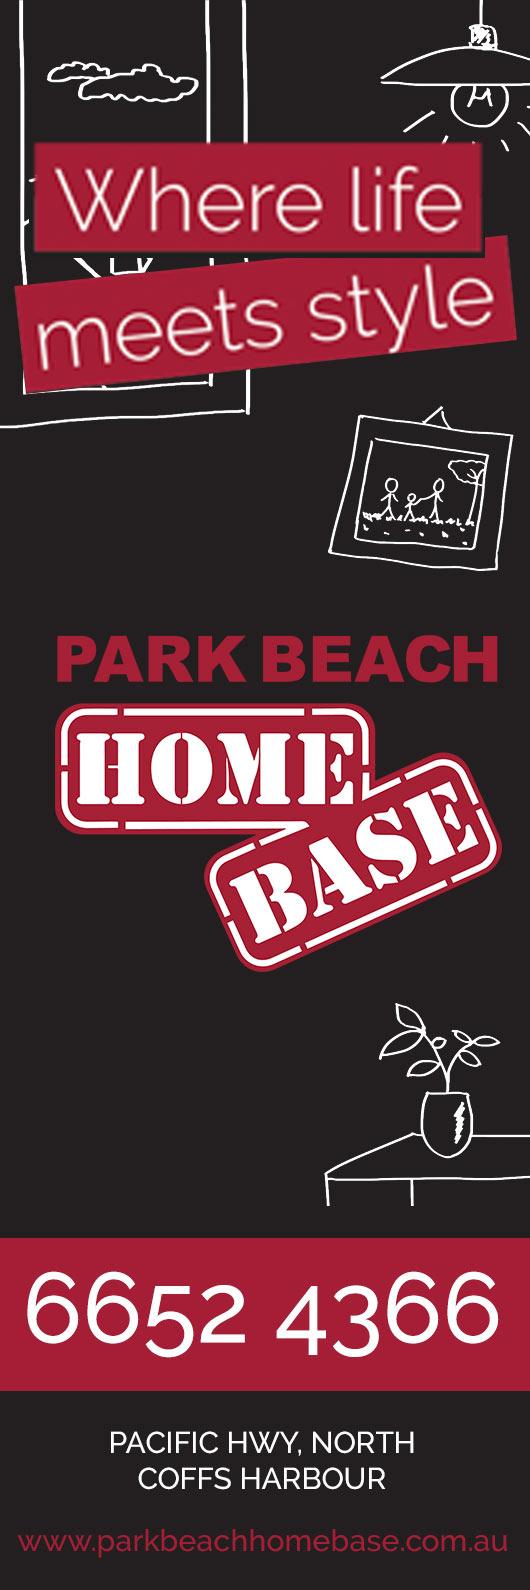 About park beach homebase